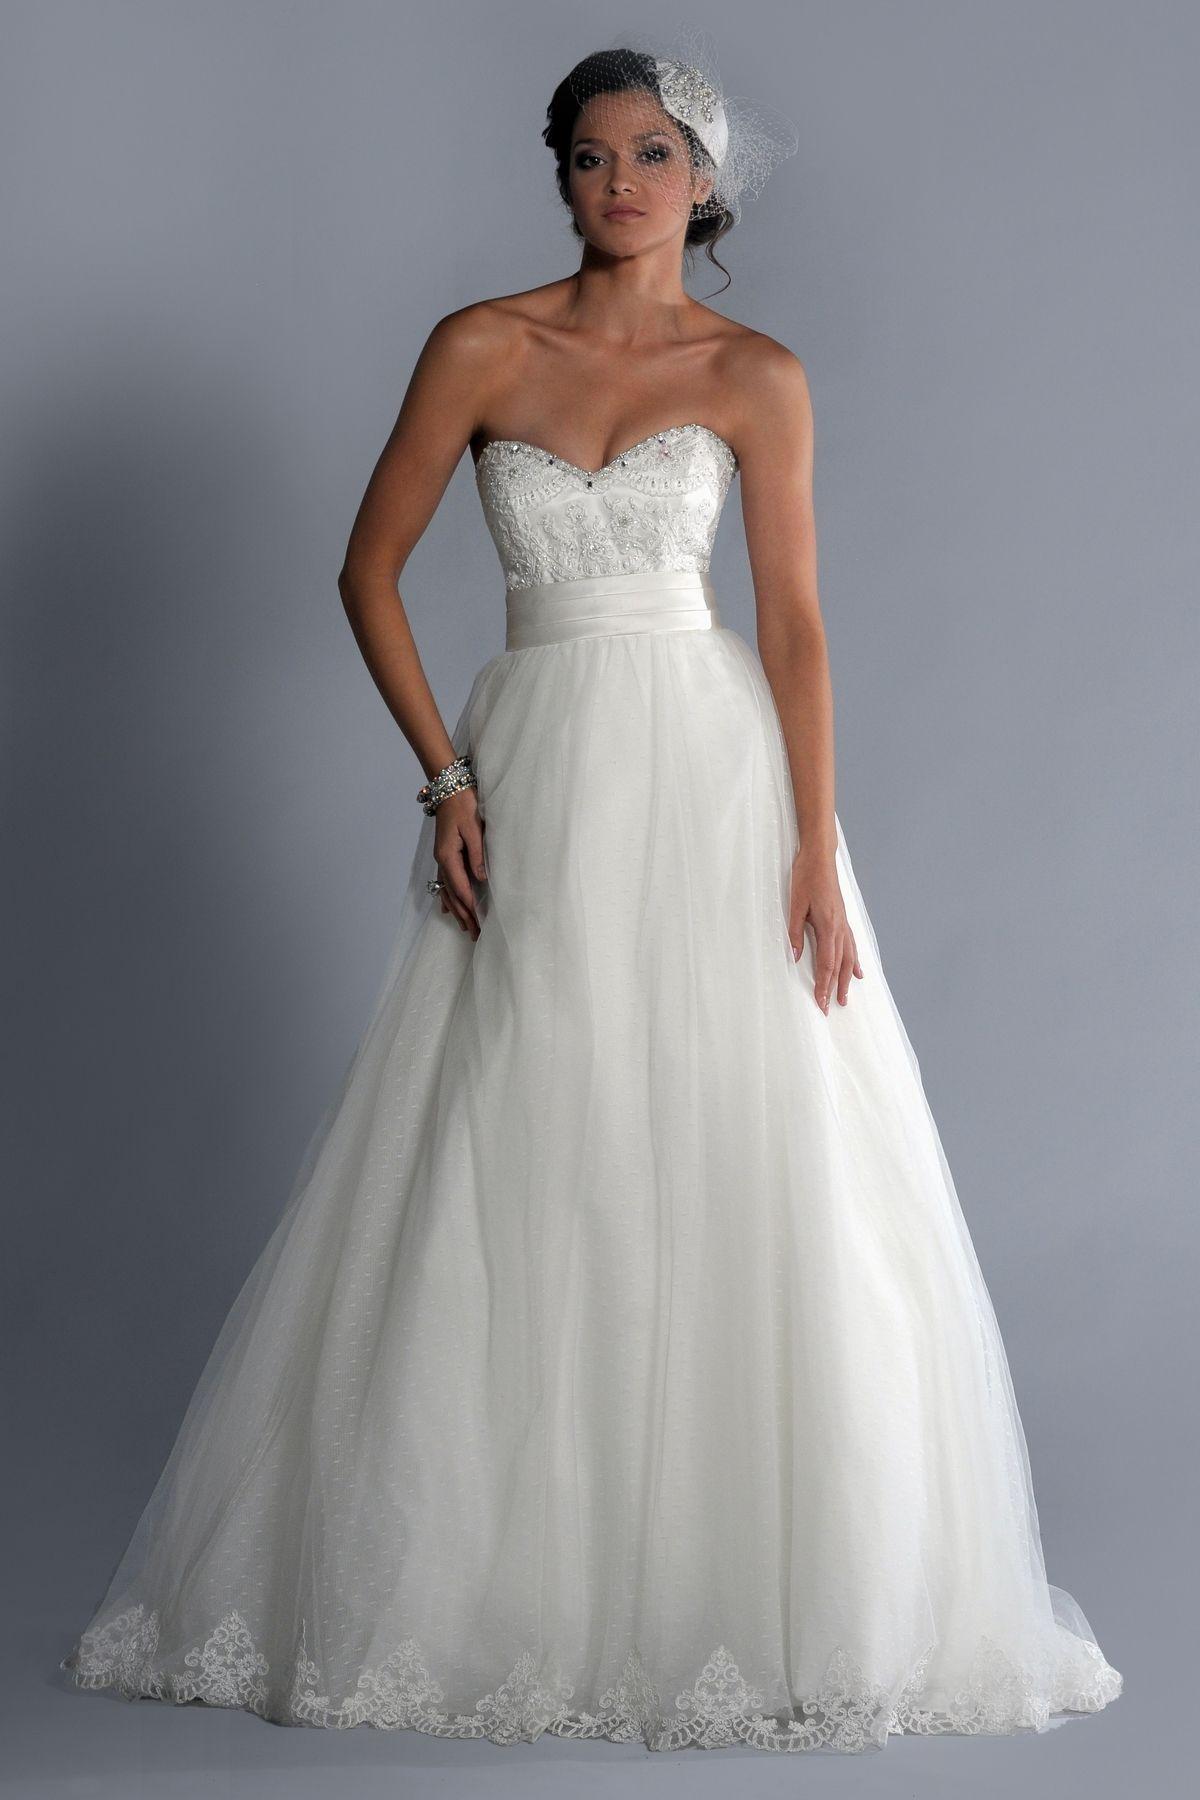 Detachable skirt wedding dress  dress with detachable skirt for dancing  Wedding Ideas  Pinterest